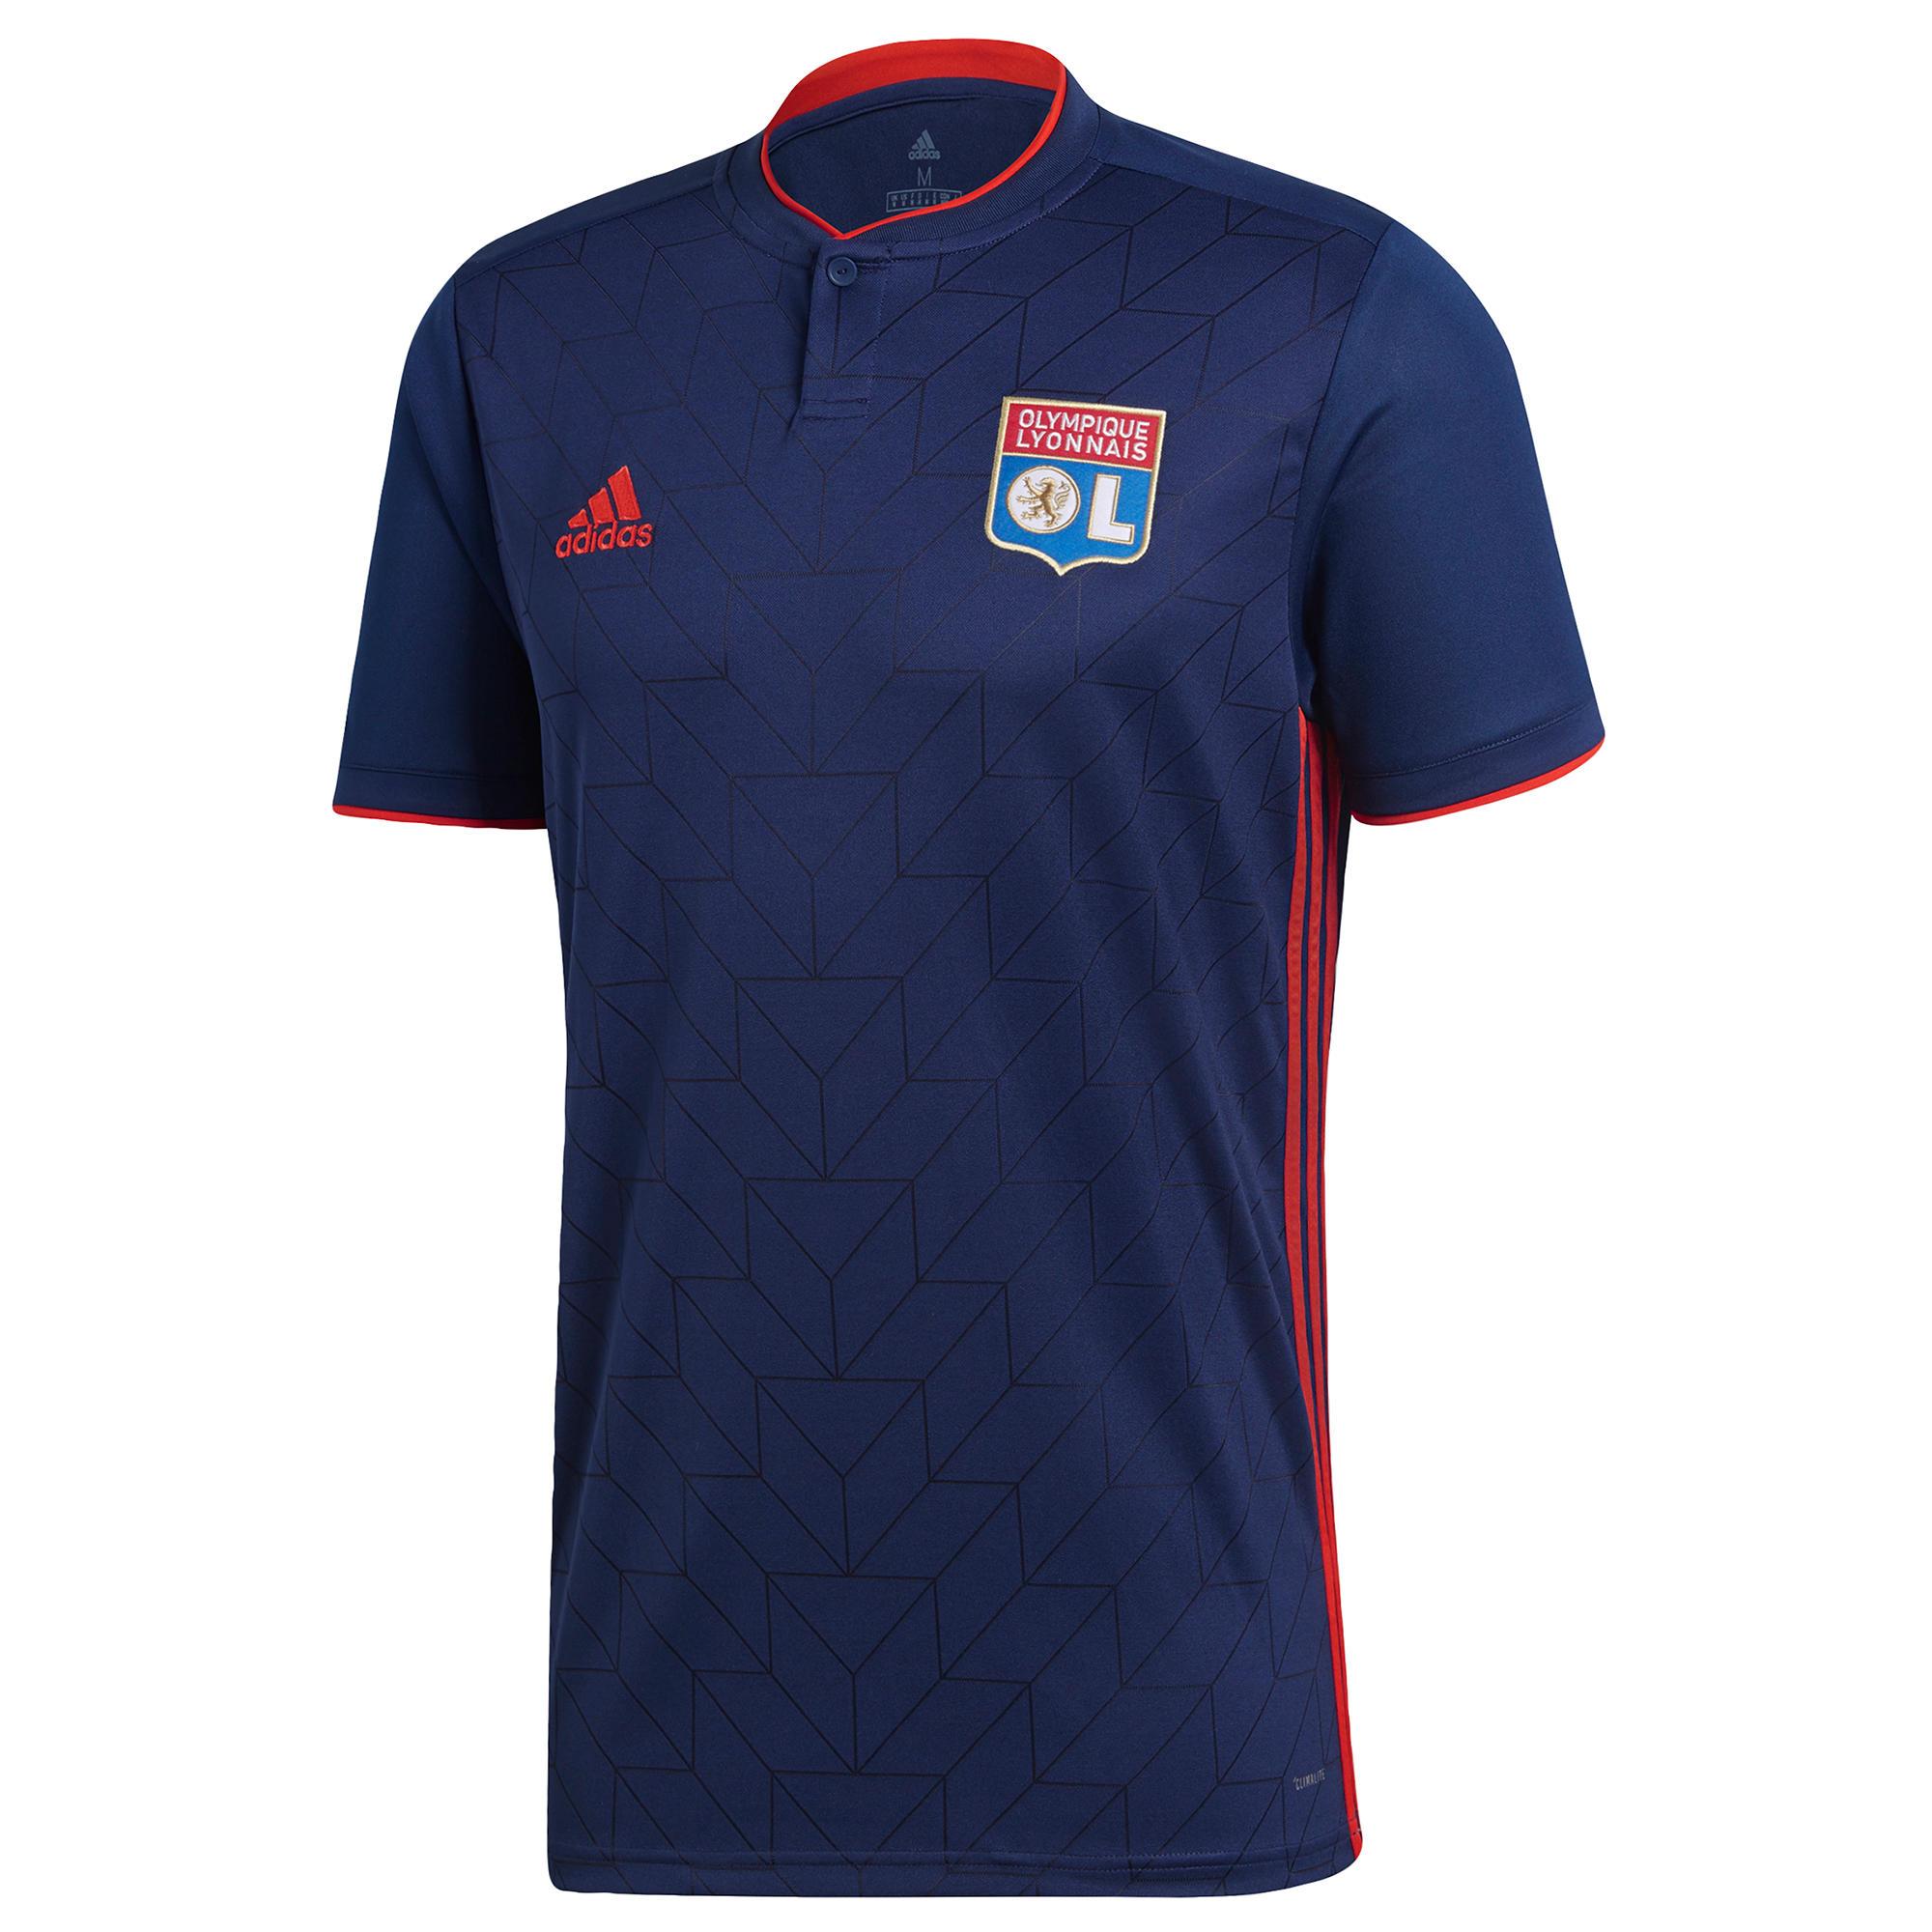 Adidas Voetbalshirt Olympique Lyon uitshirt 18/19 blauw